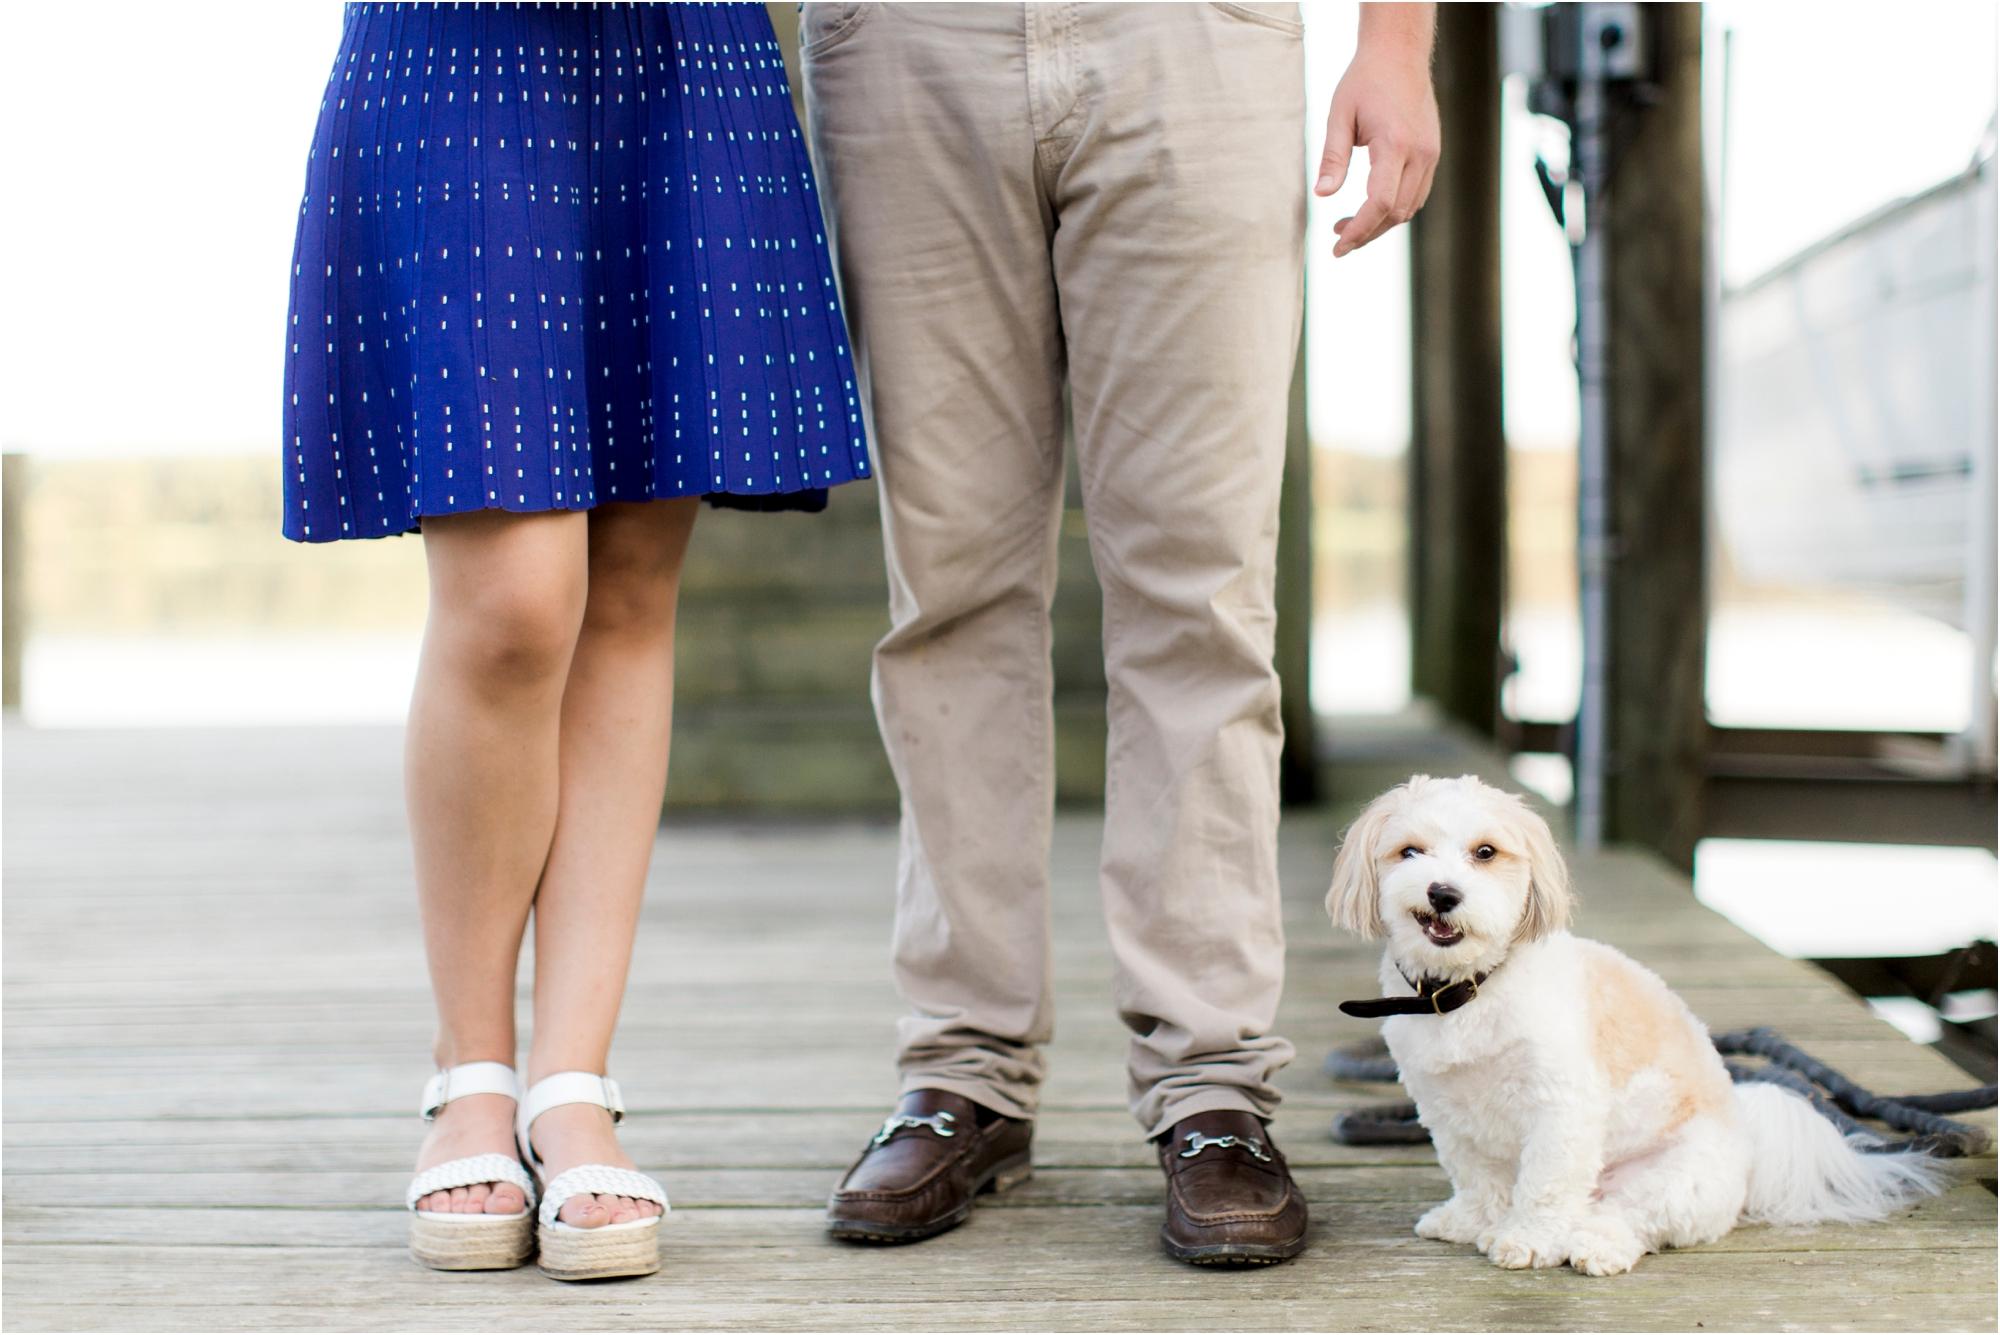 claire-thomas-puppy-finn-james-river-richmond-virginia-enagement-session_0013.jpg